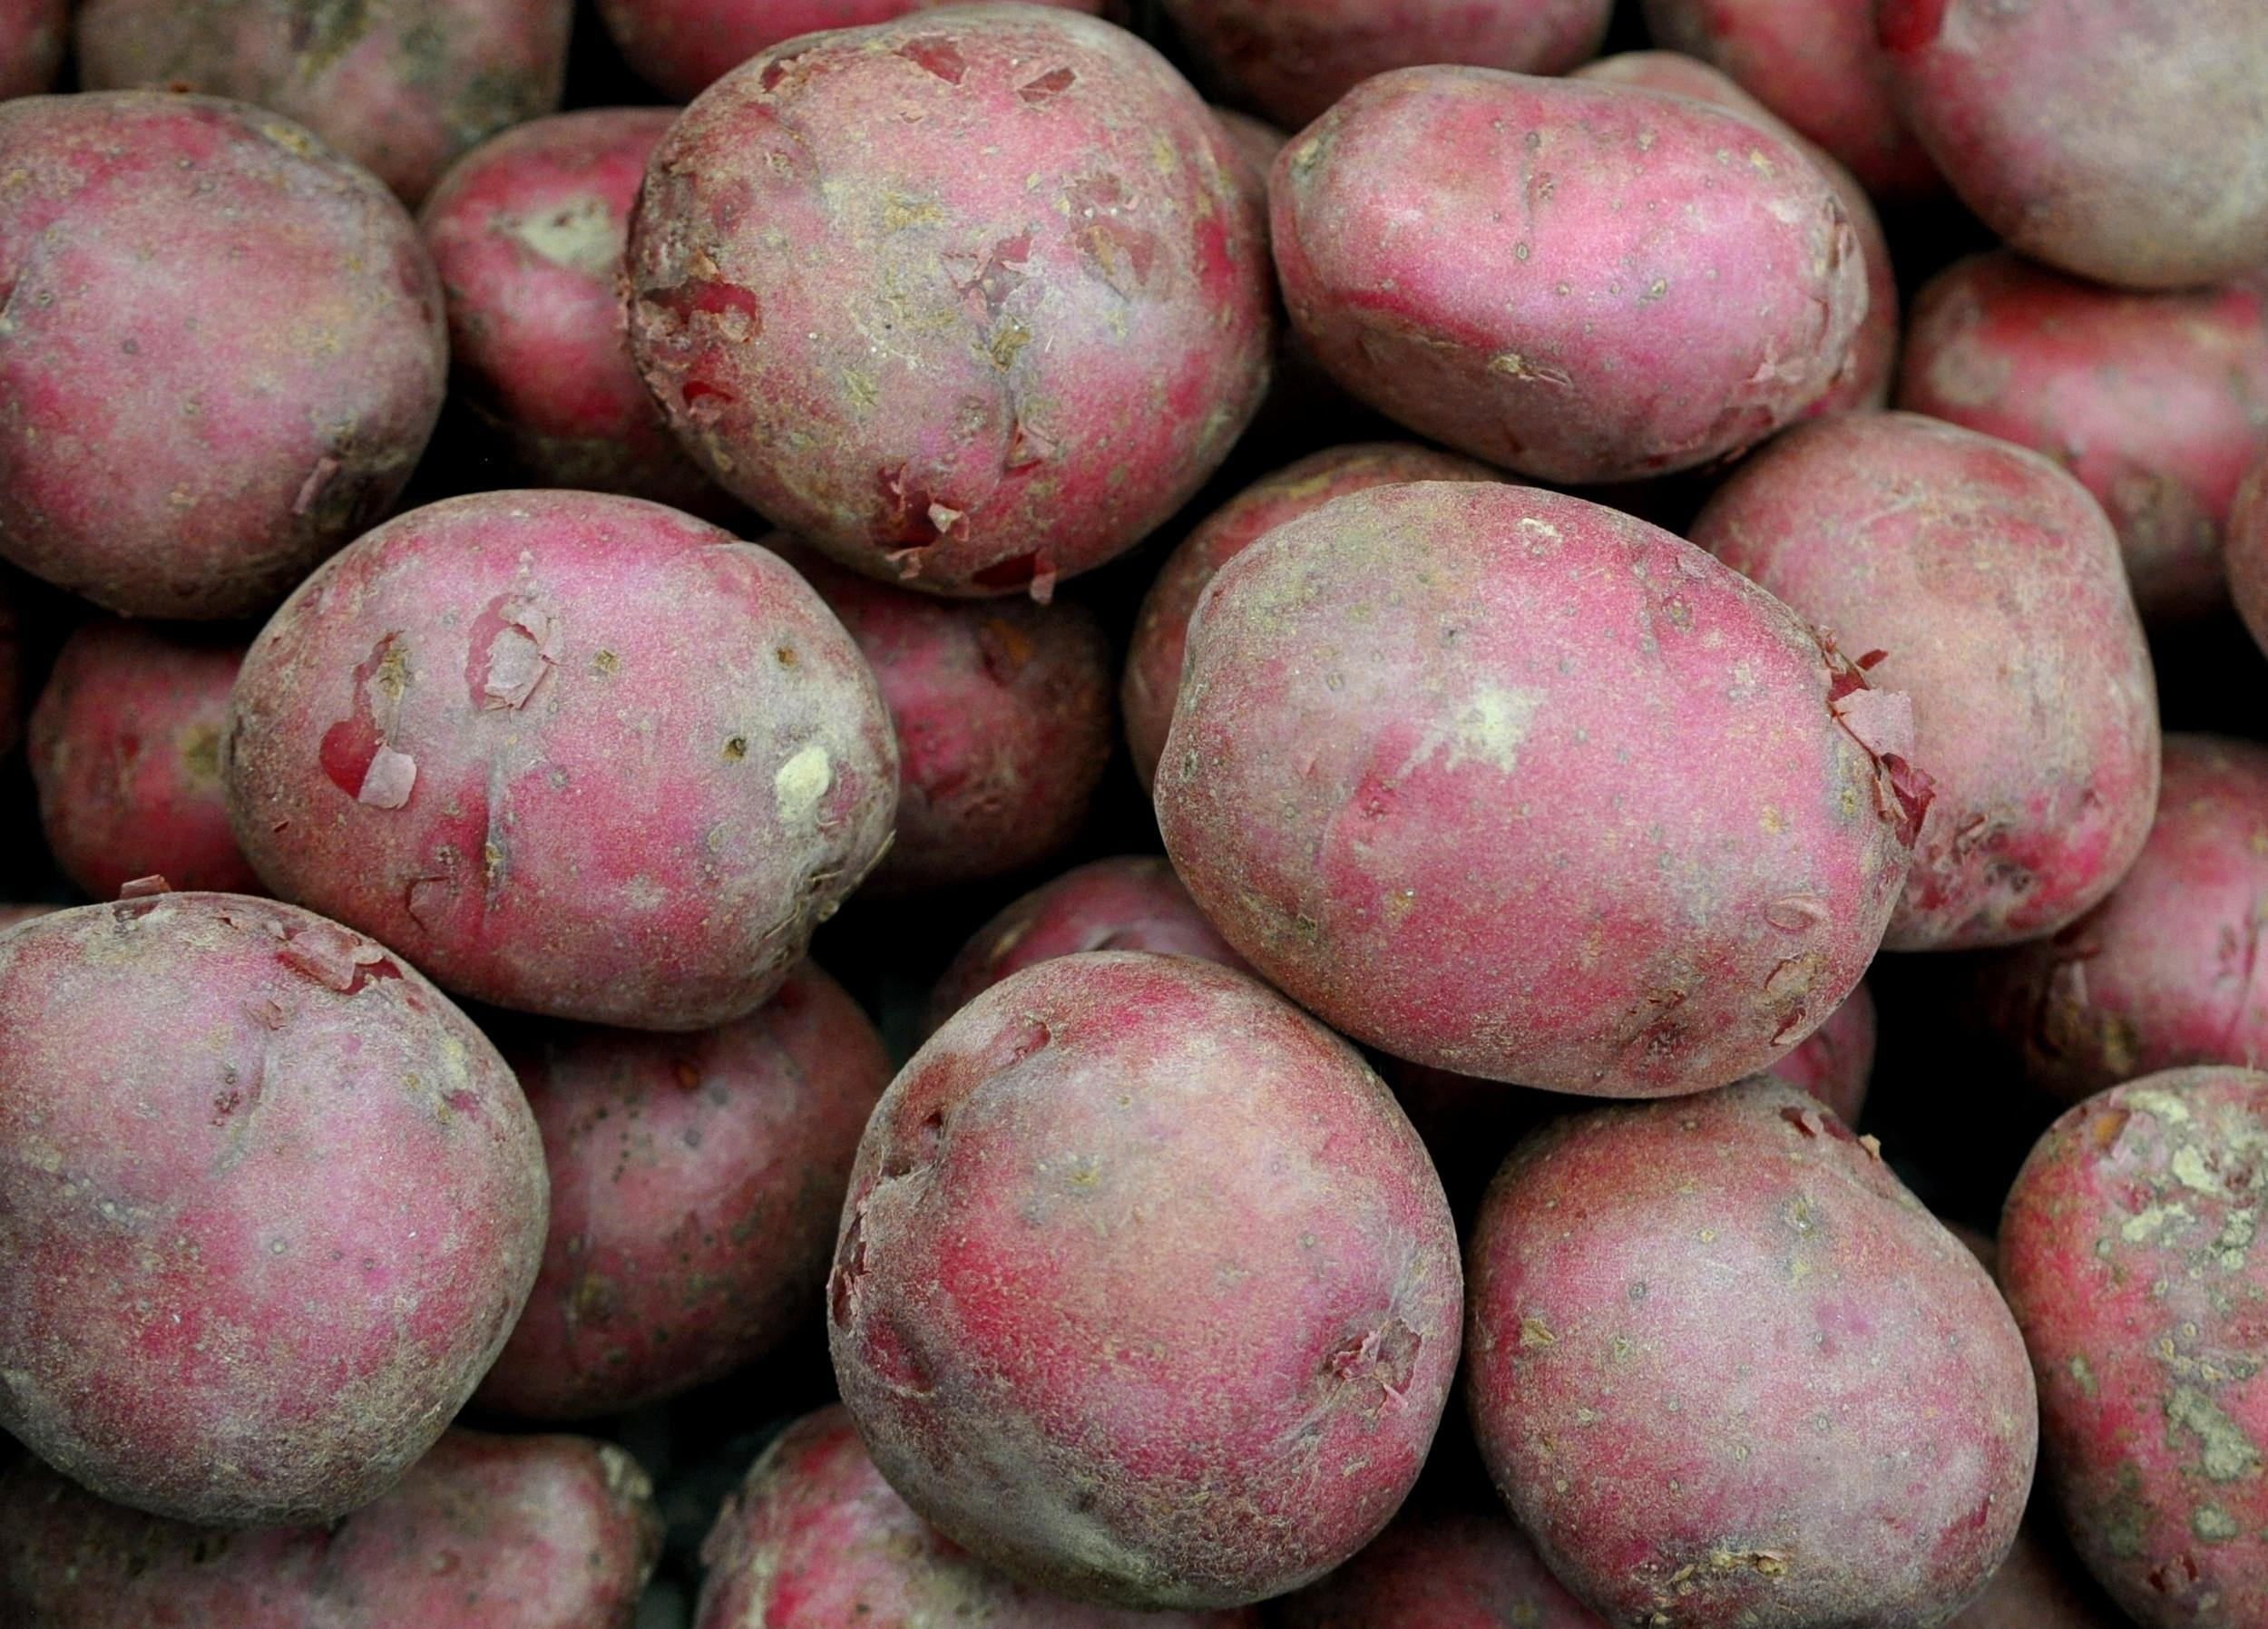 Mountain Rose potatoes from Olsen Farms at Ballard Farmers Market. Copyright Zachary D. Lyons.